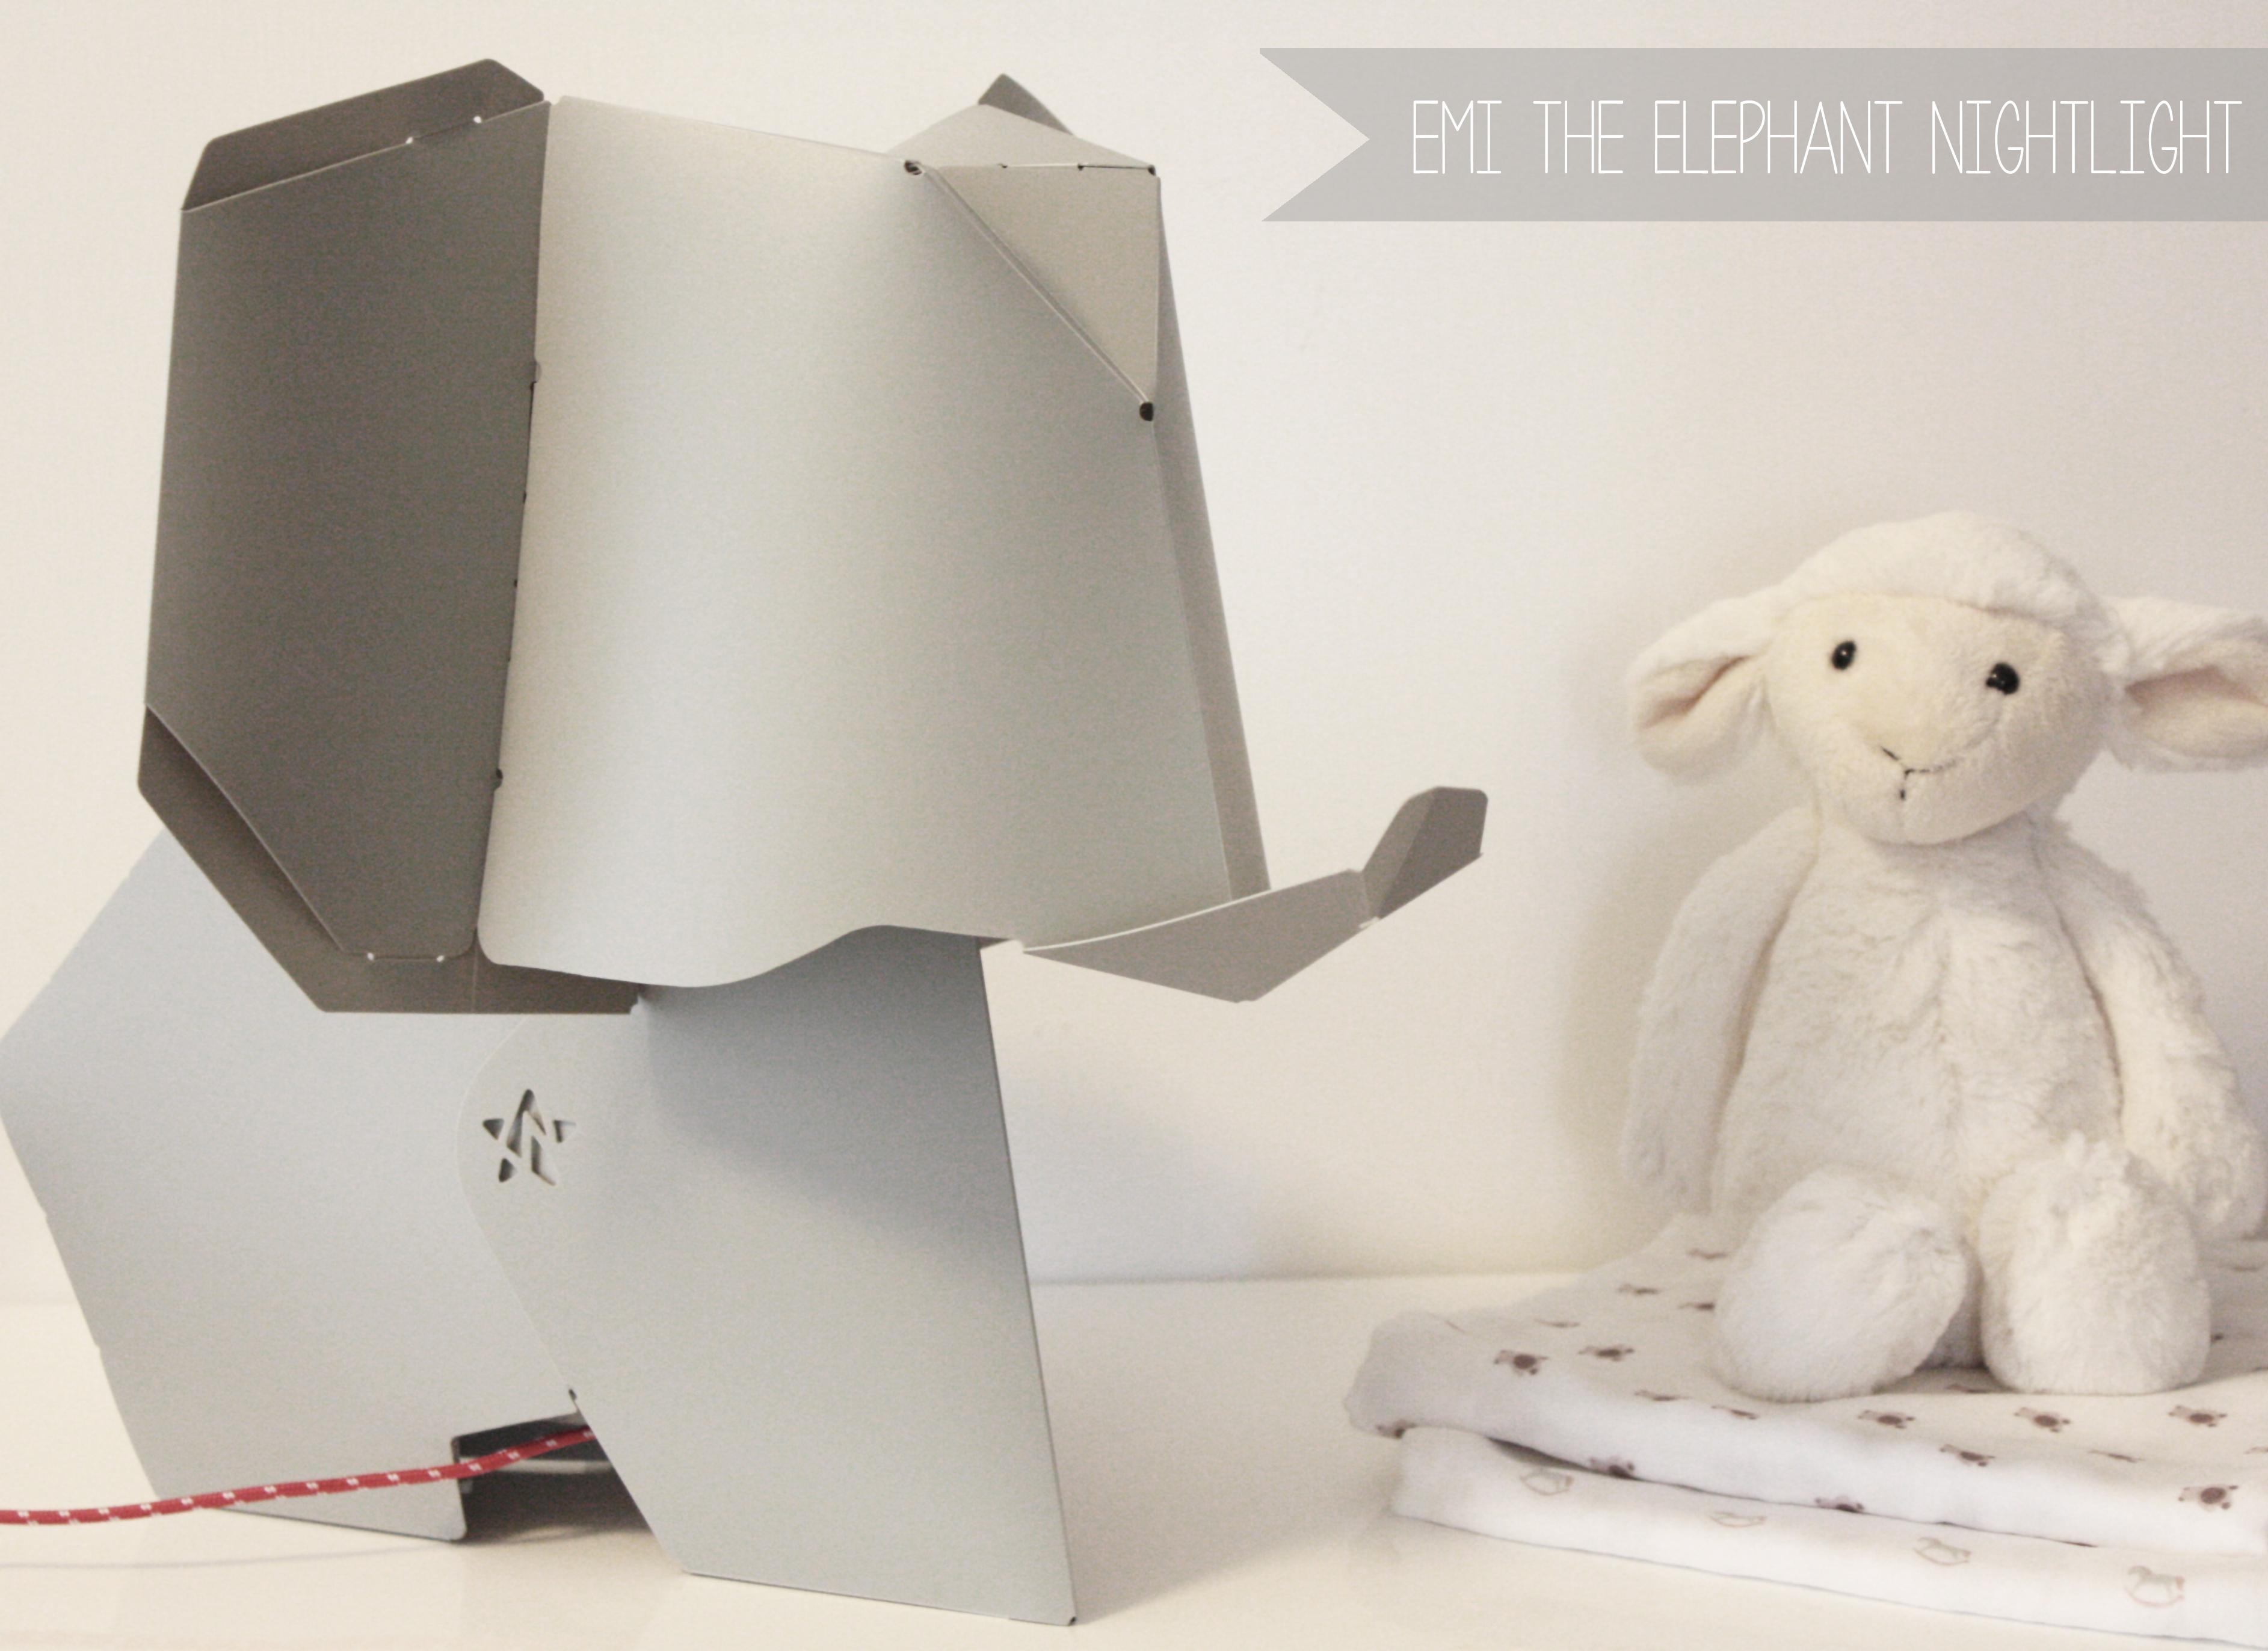 Review: Emi The Elephant Nightlight